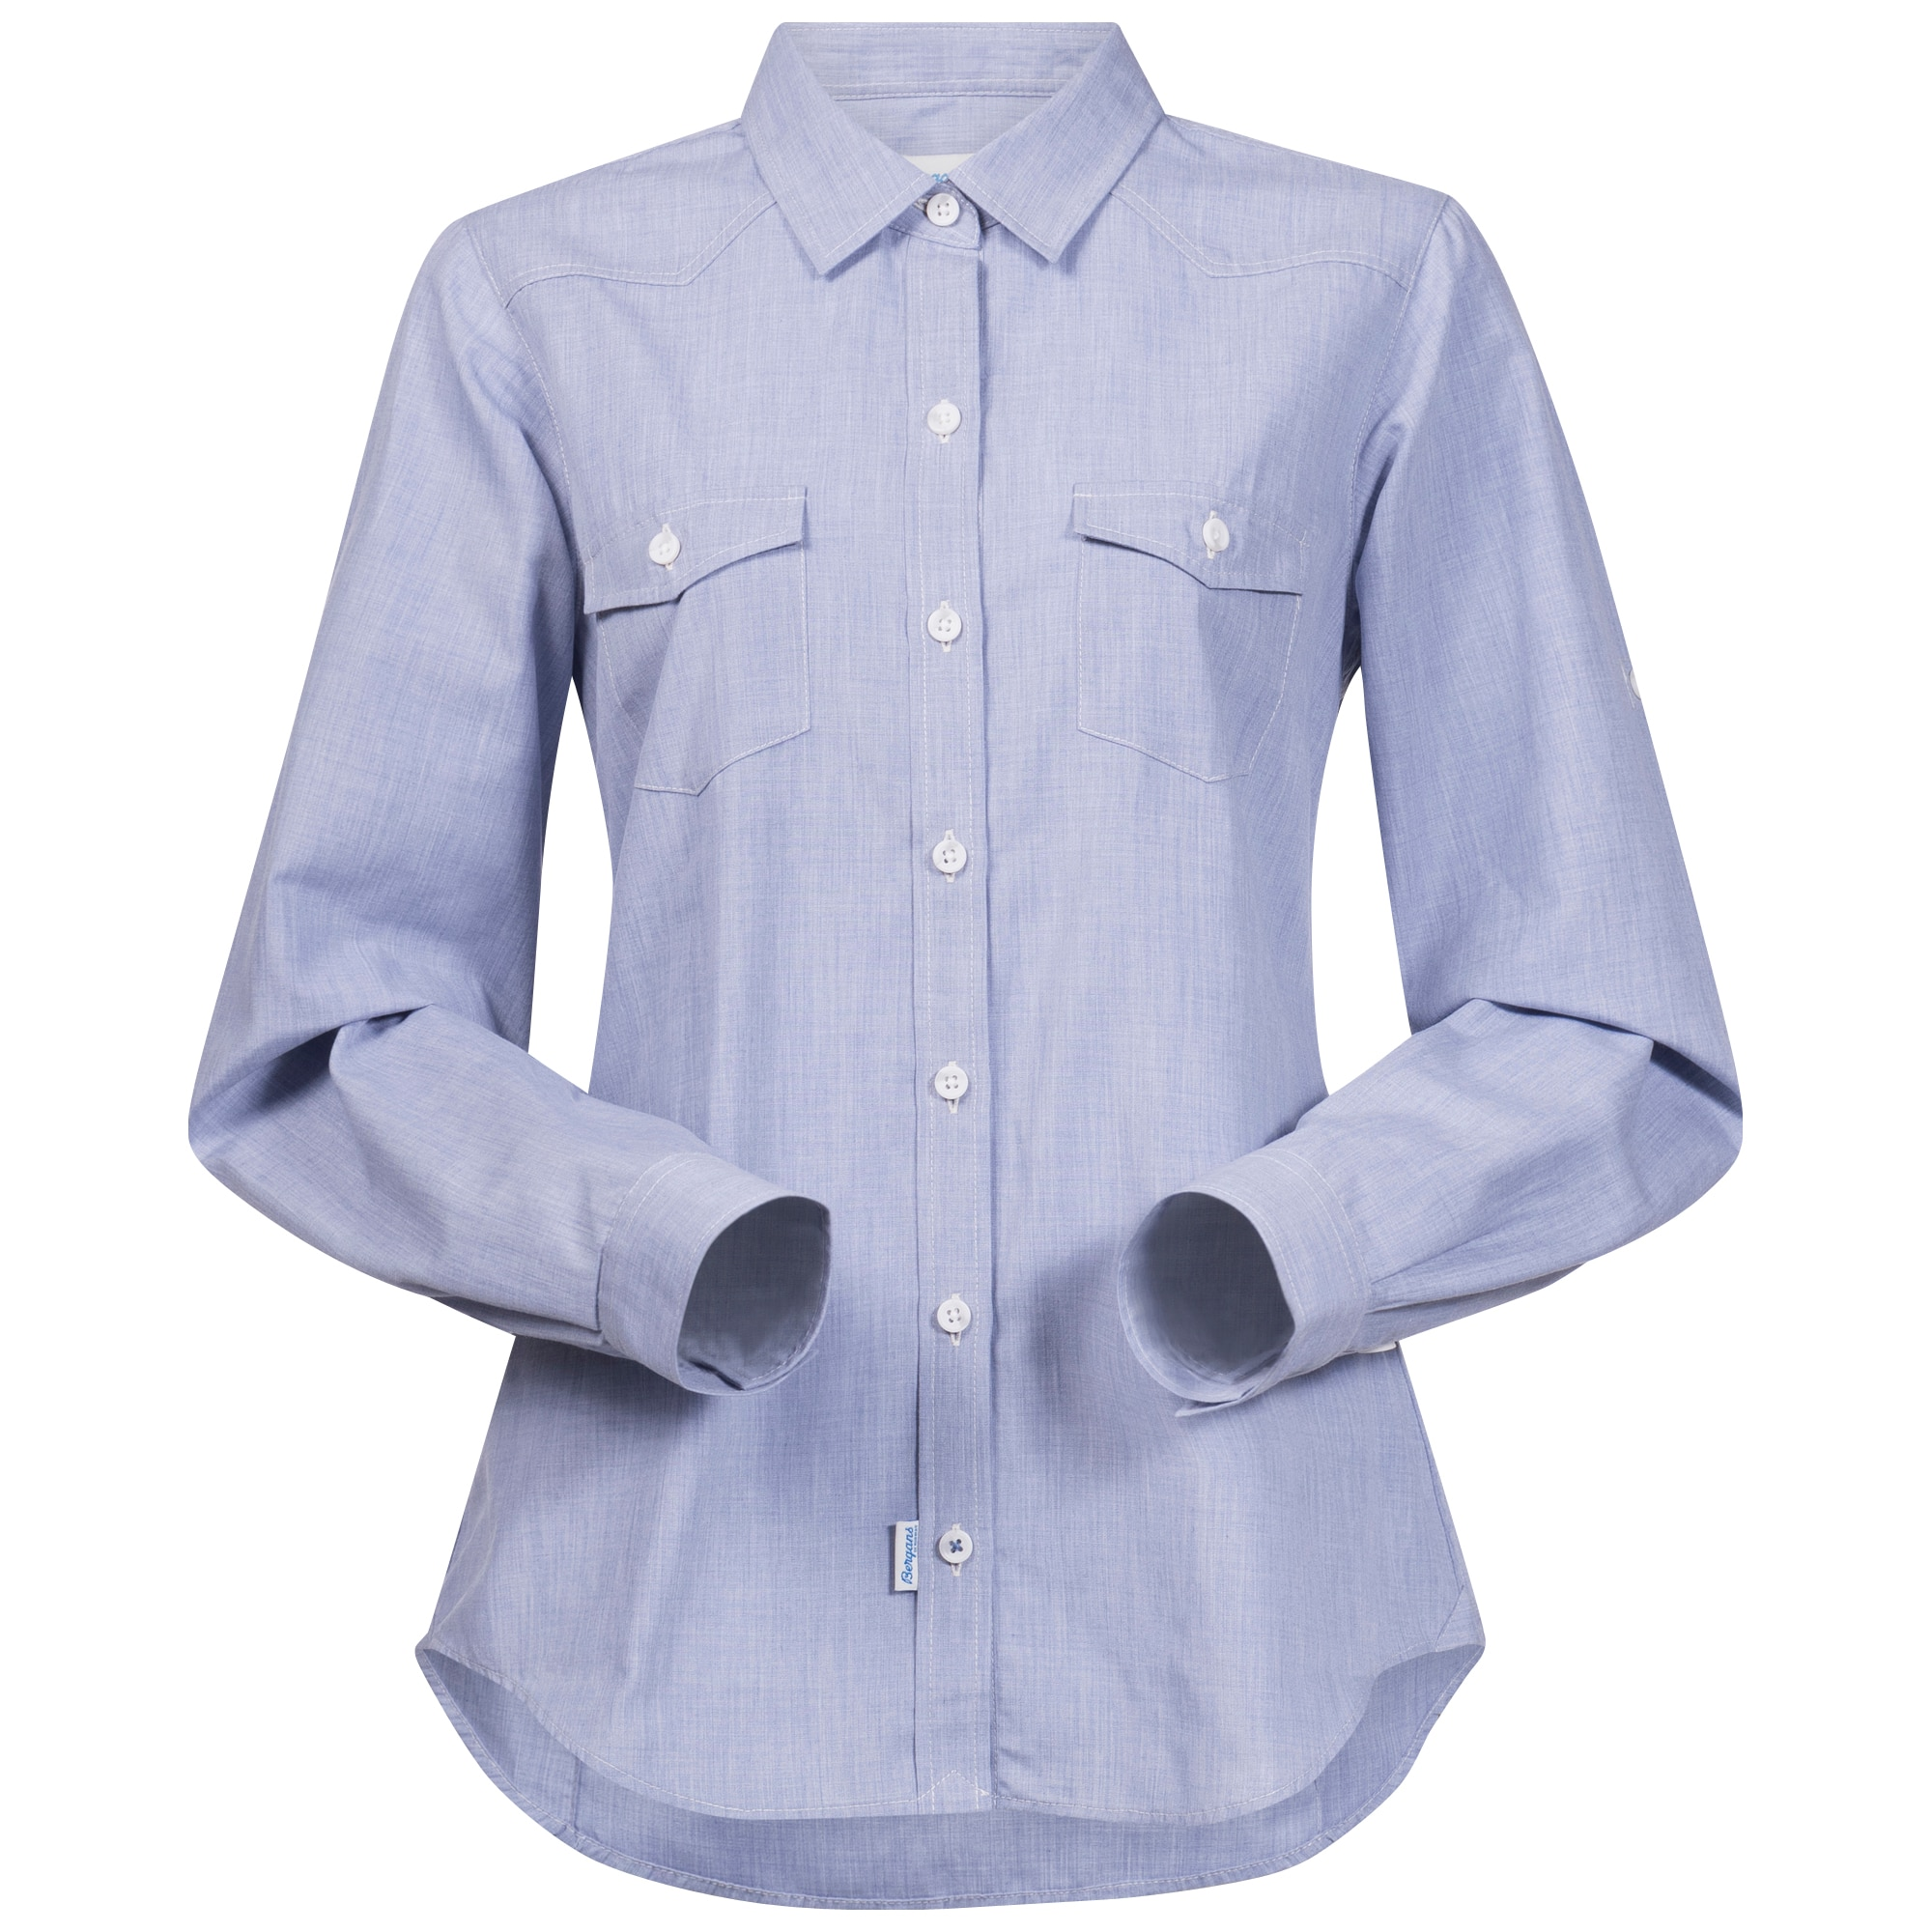 Justøy Lady Shirt Long Sleeve